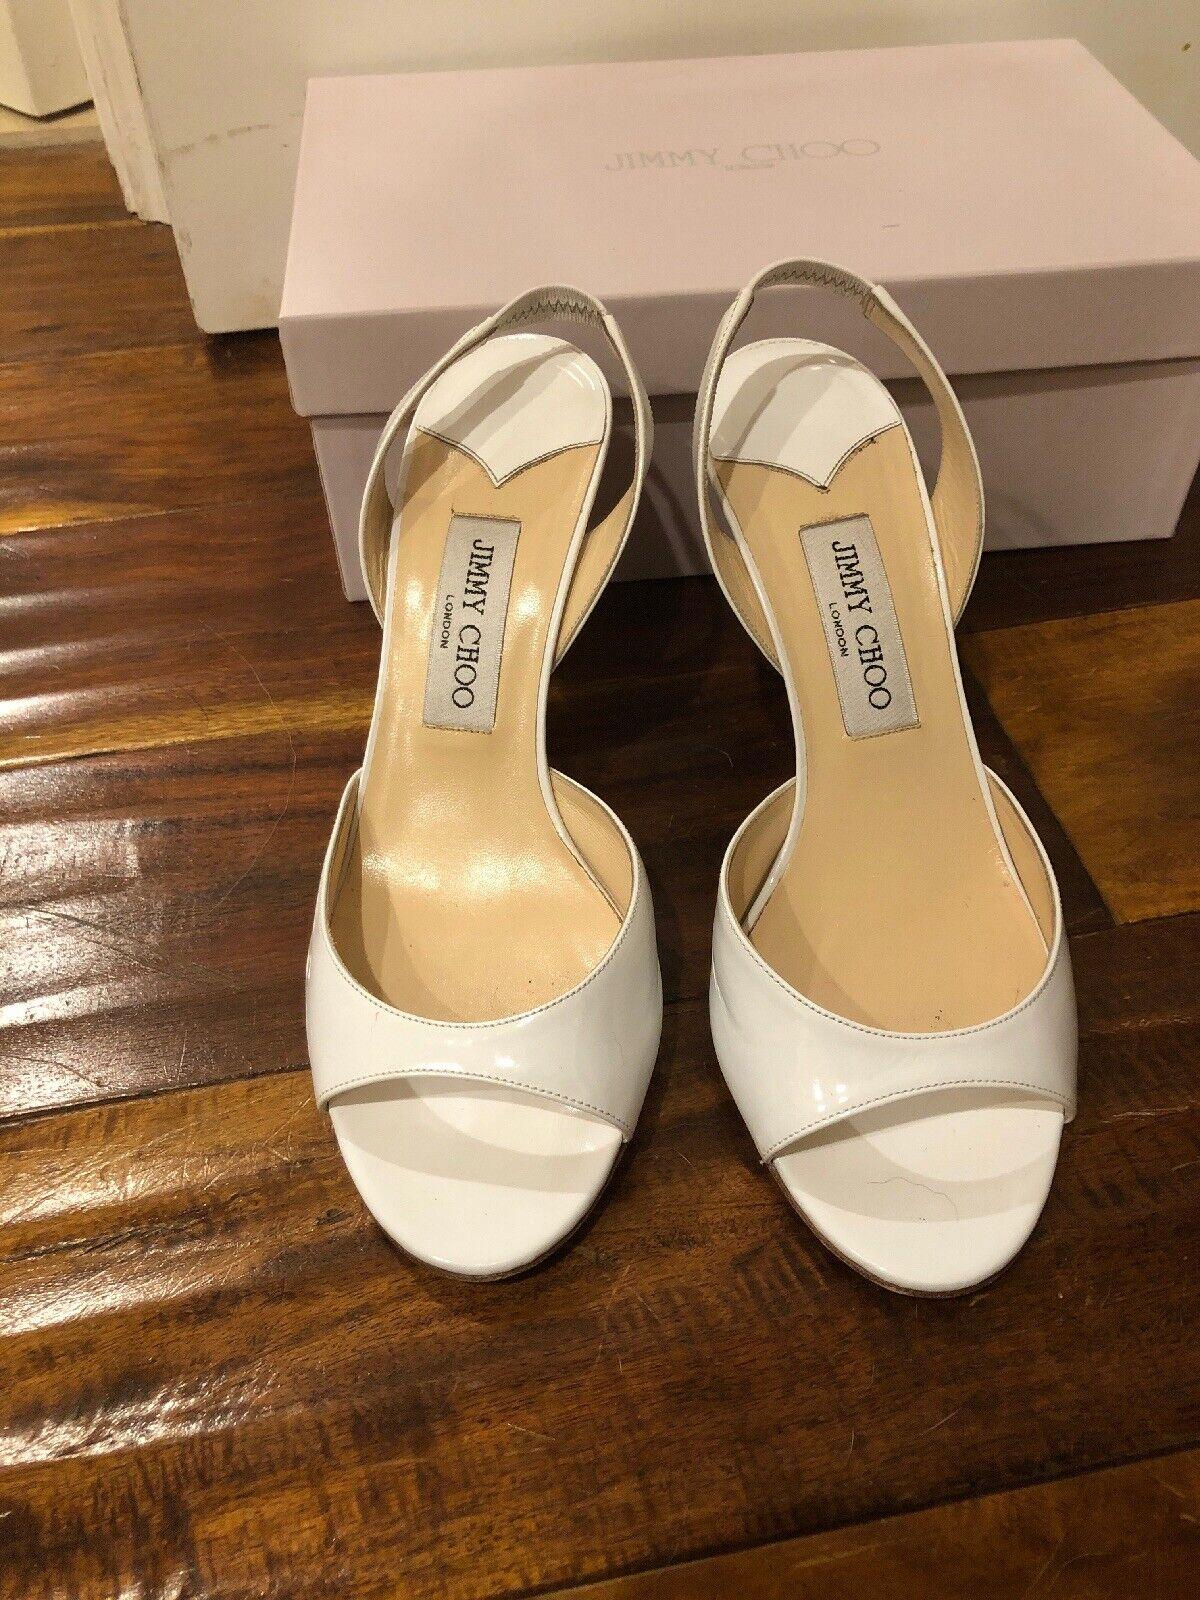 Jimmy Choo White Patent Slingback Heels 39.5